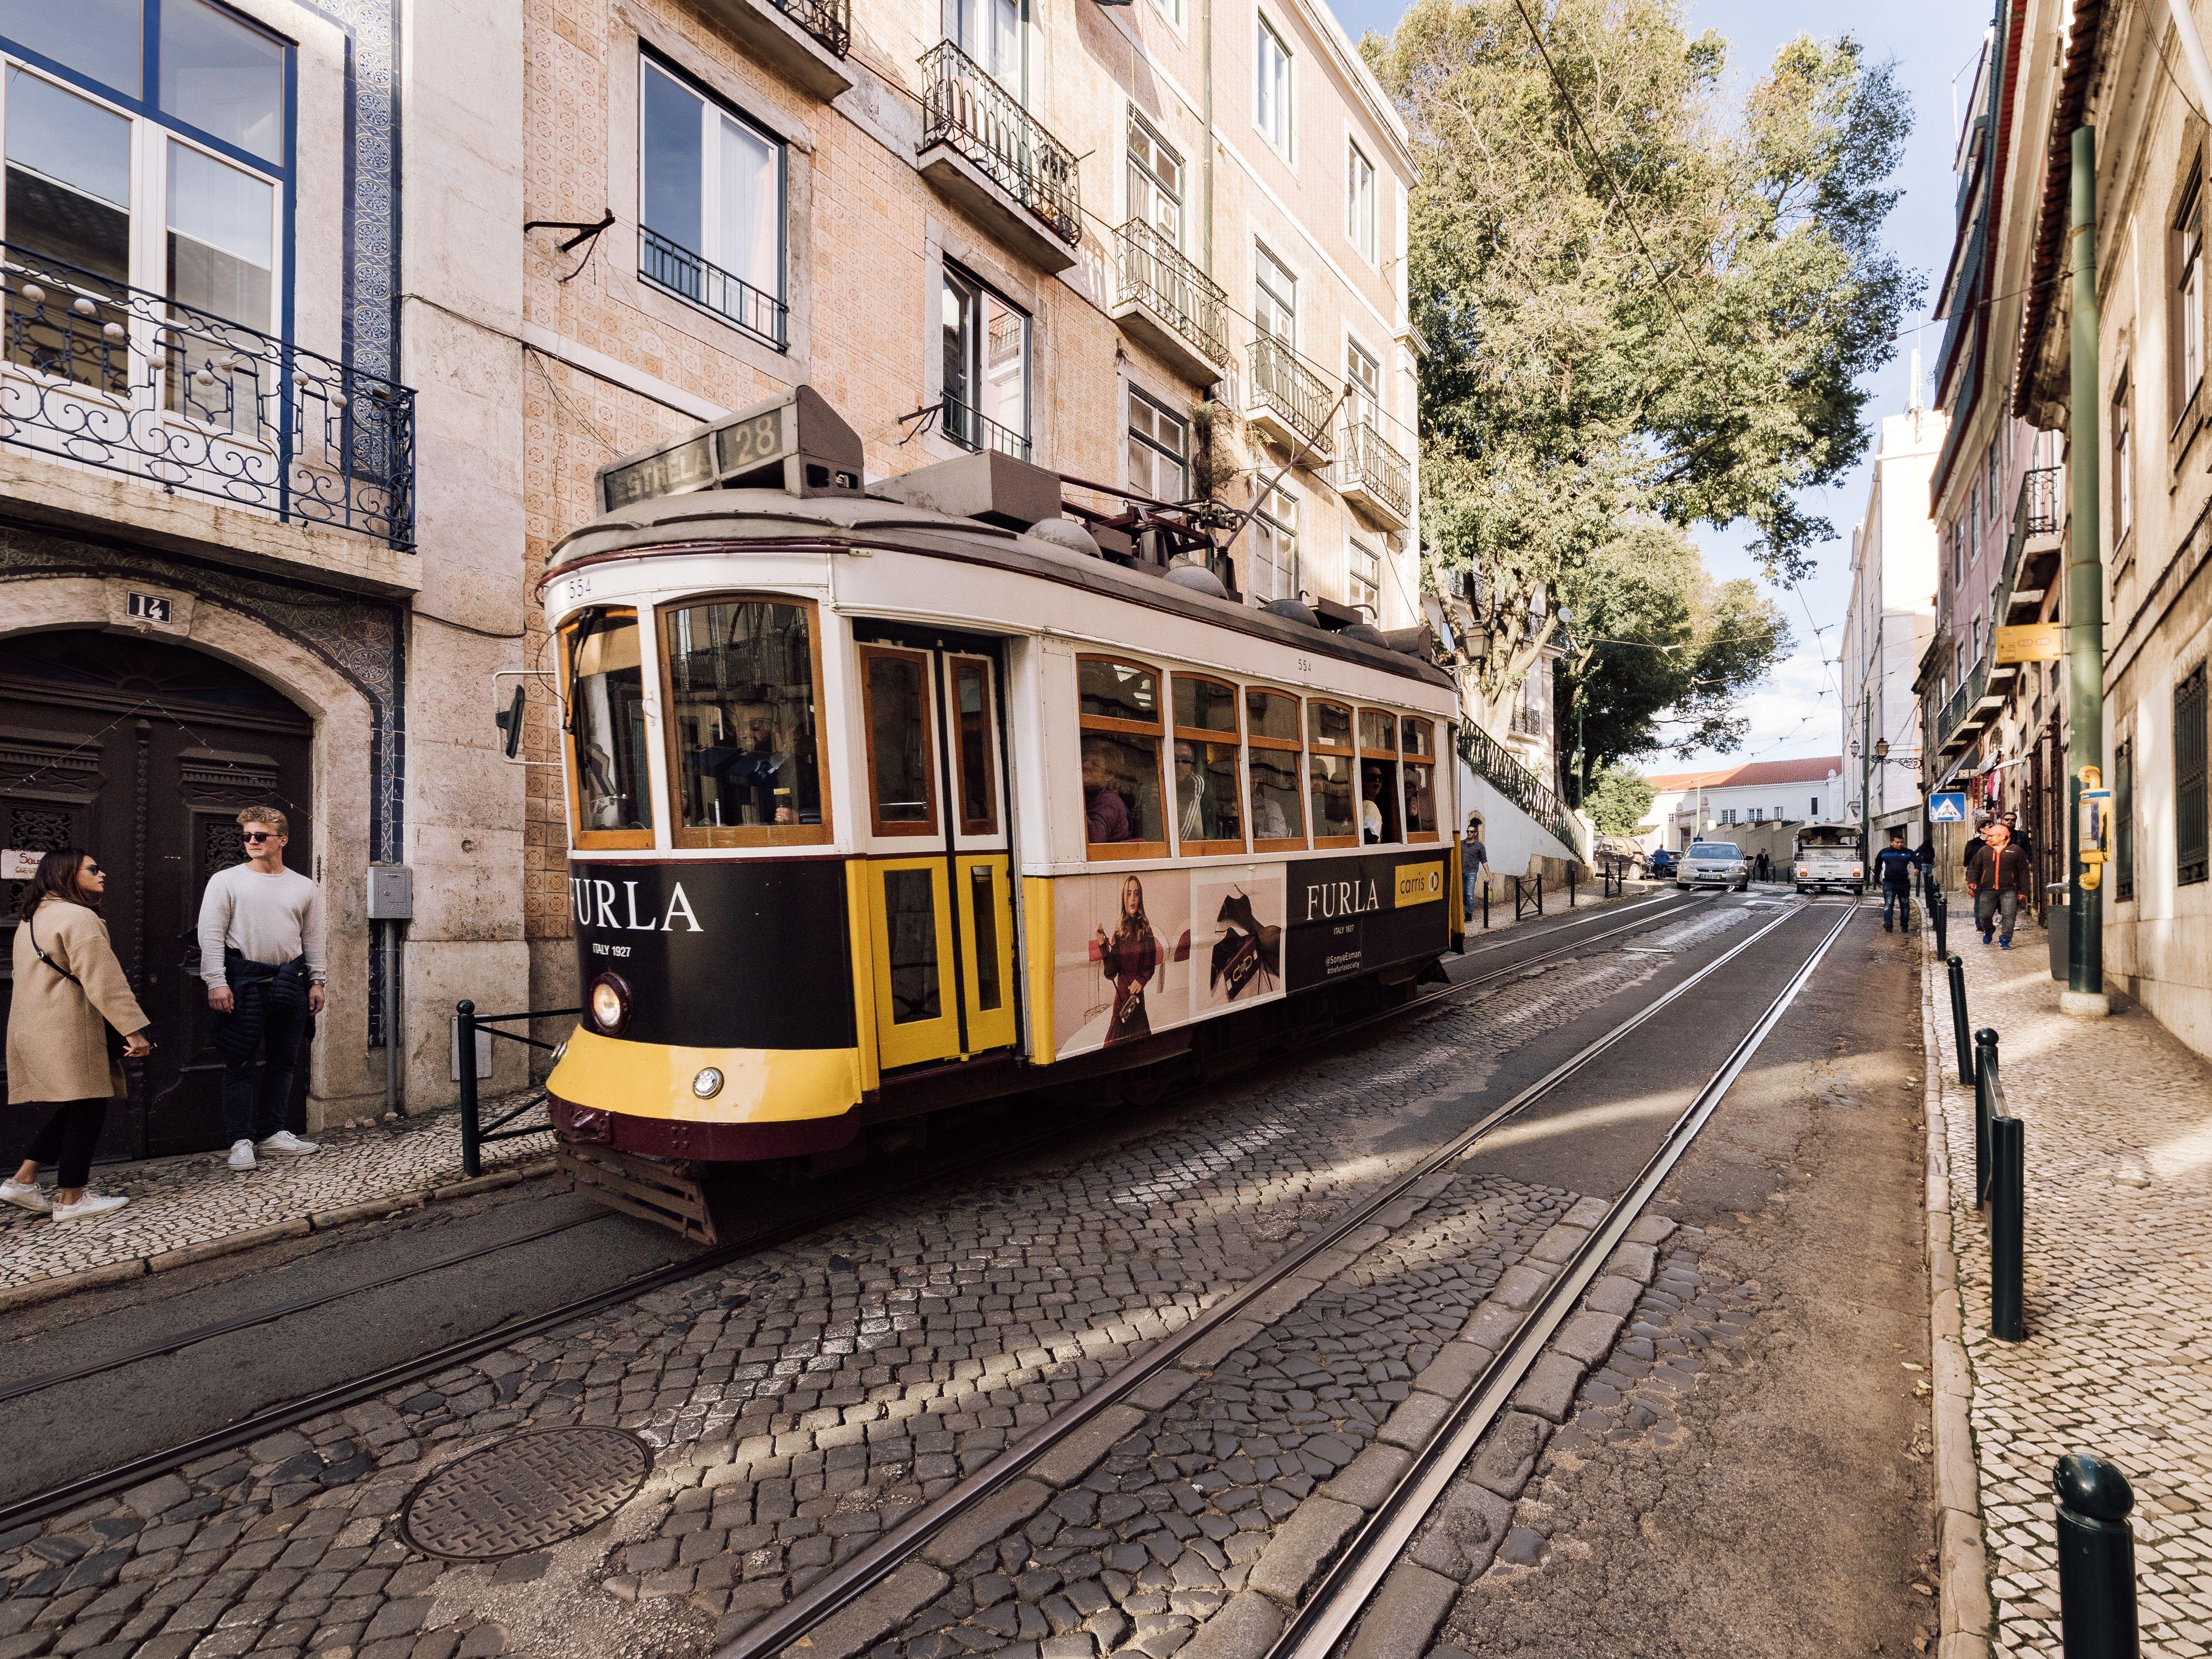 Lisbon - Planning a Trip to Portugal's Capital on alto do pina lisbon, portugal lisbon, santos-o-velho lisbon, prazeres lisbon, campo grande lisbon, castelo lisbon, alvalade lisbon,